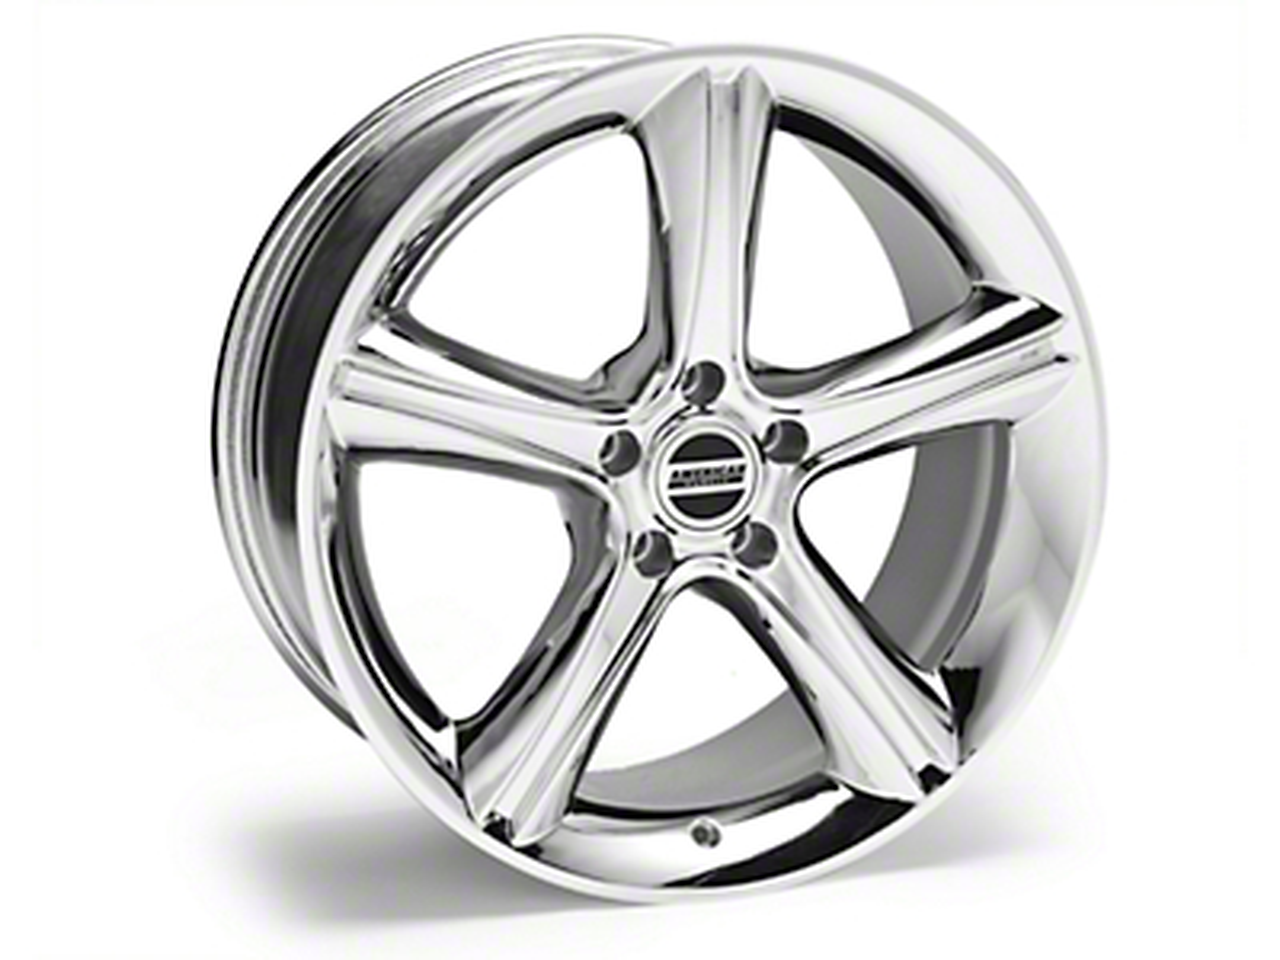 2010 GT Premium Style Chrome Wheel - 19x8.5 (94-04 All)